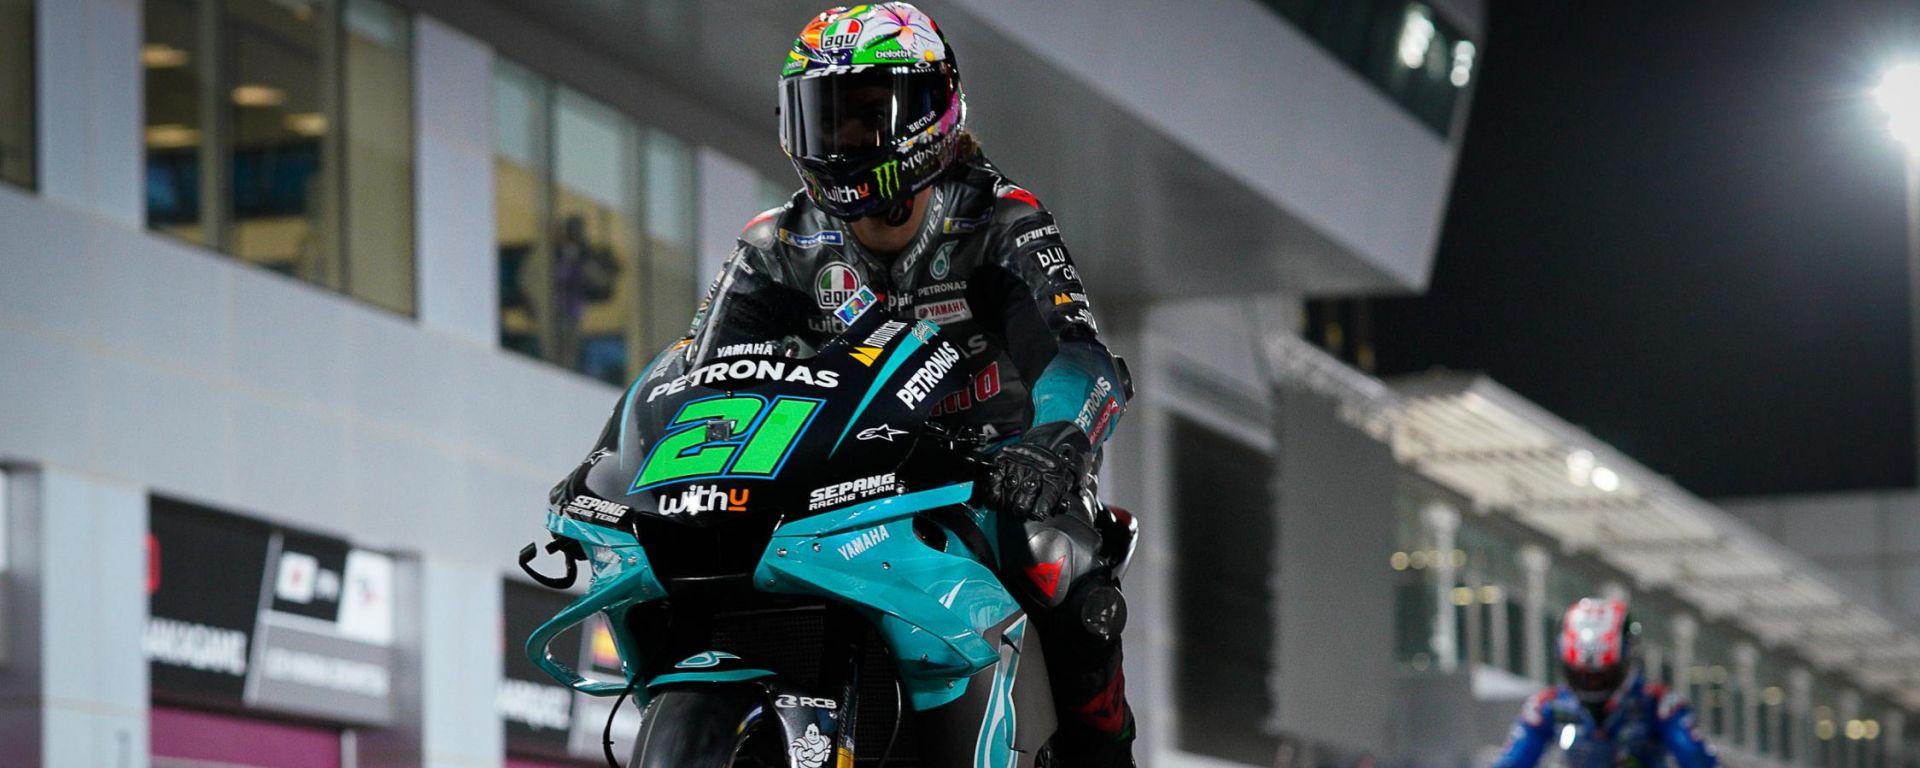 MotoGP, GP Doha 2021: Franco Morbidelli (Yamaha Petronas)